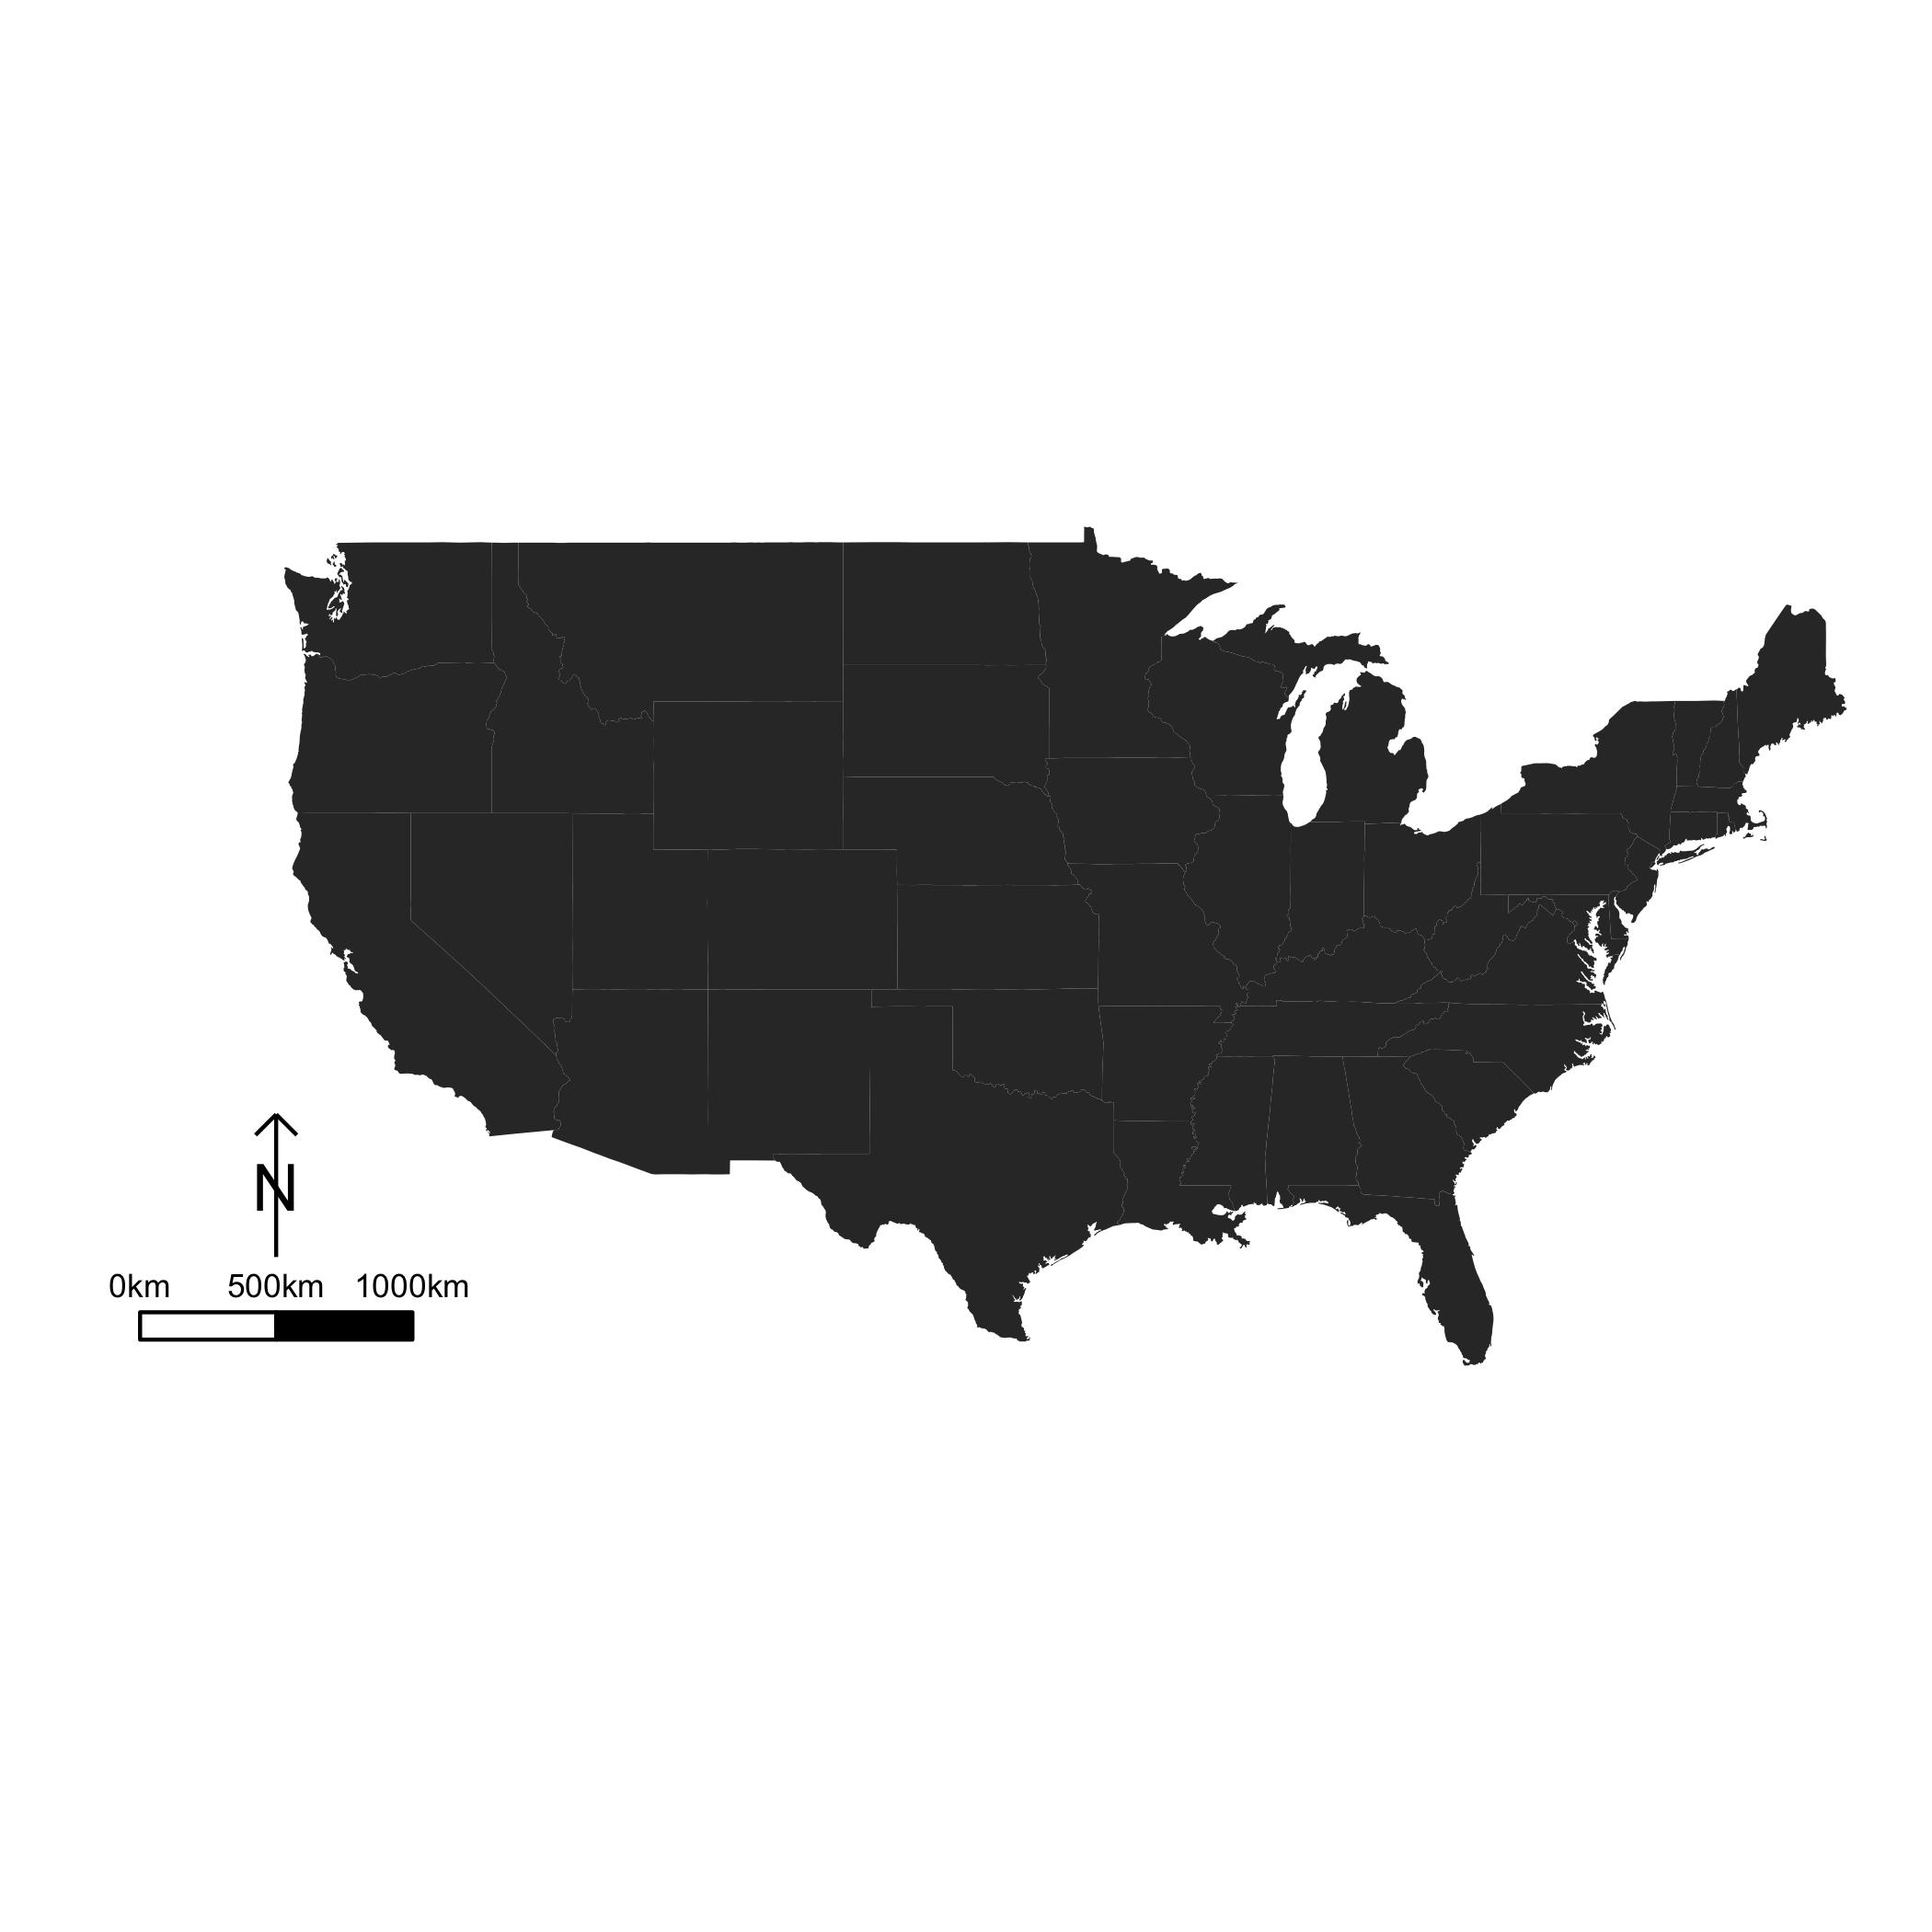 Us Map Using Ggplot2 And Scalebar